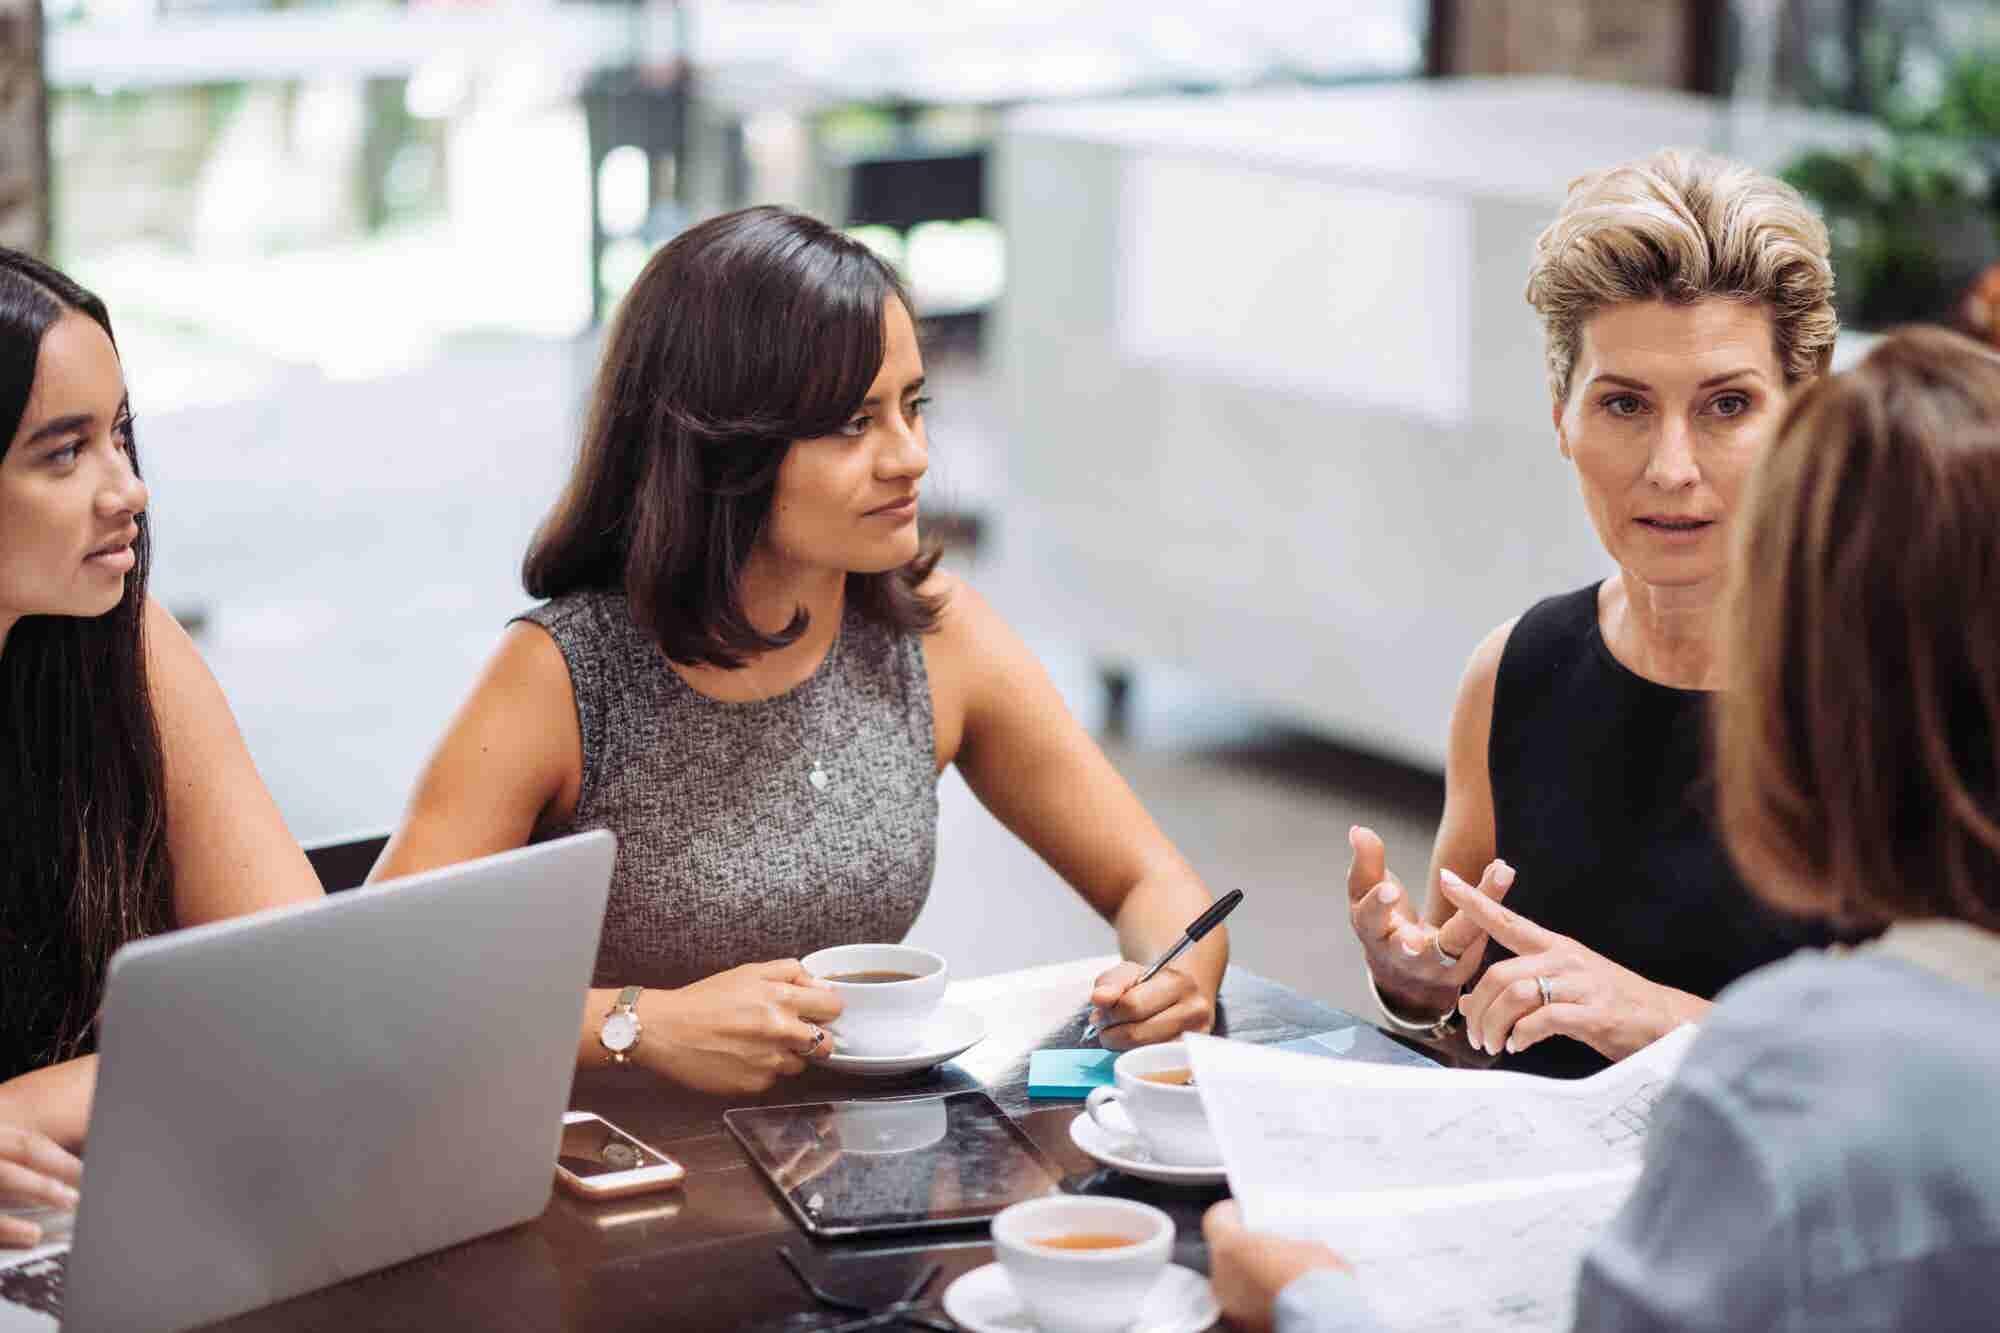 Progress for Women in the Workplace Has Been Poor